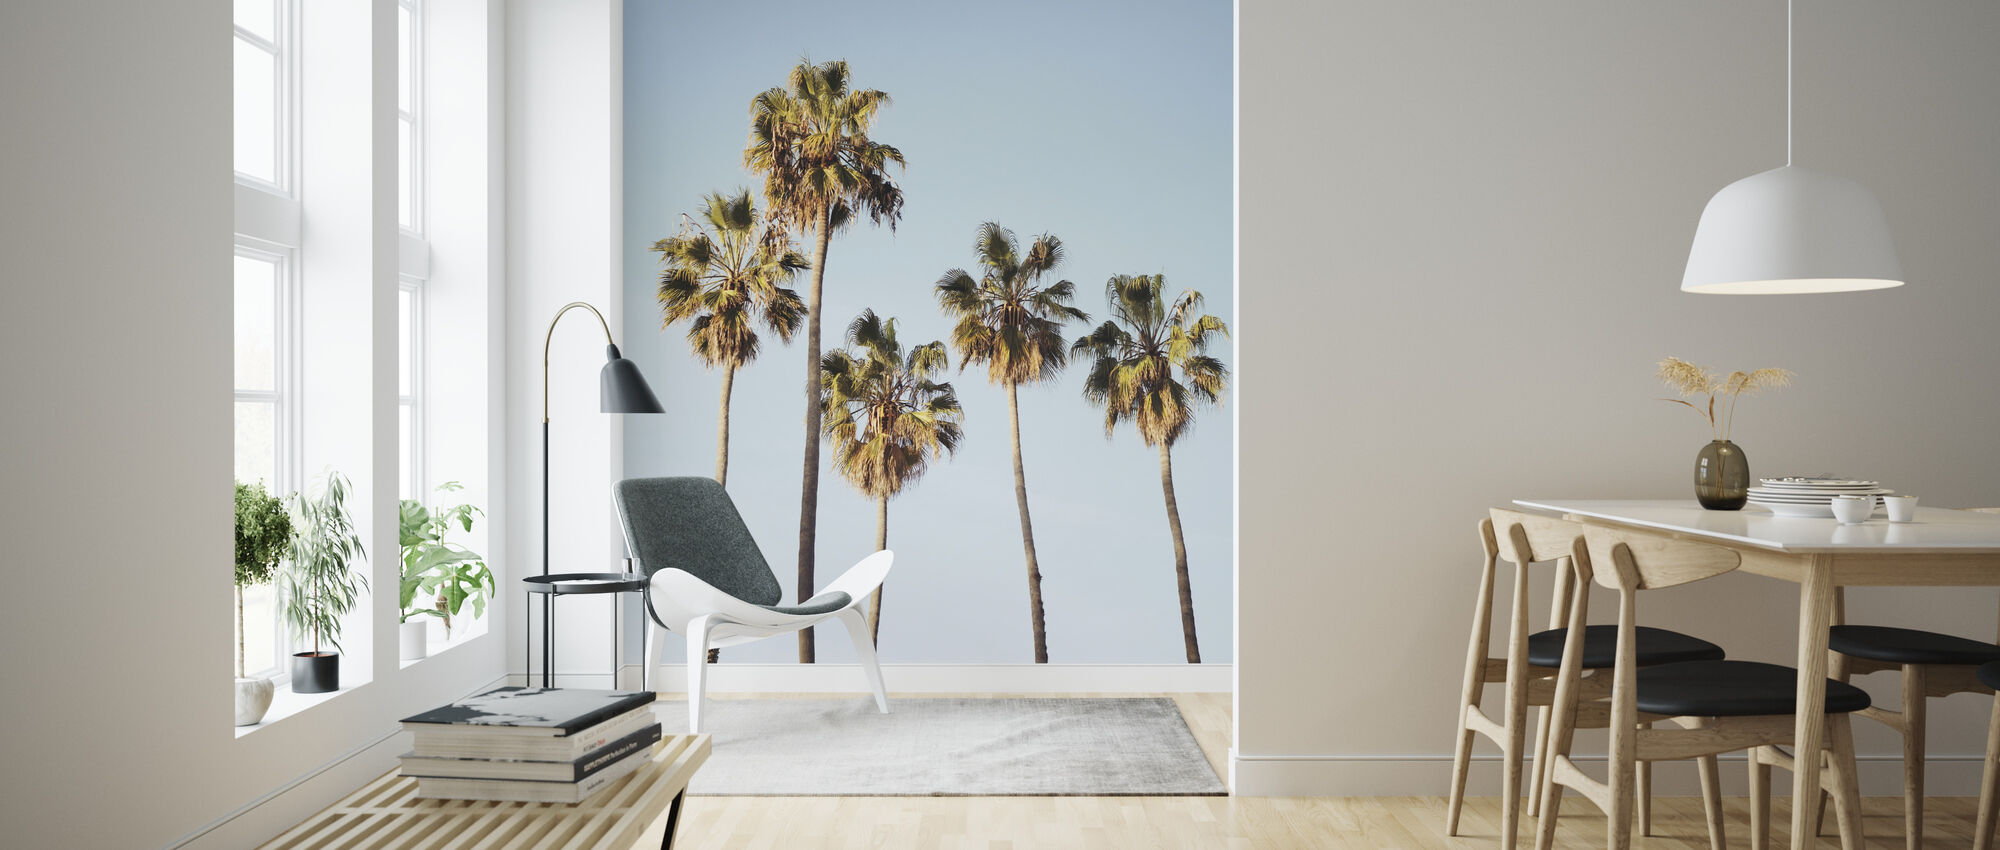 Endless Summer II - Wallpaper - Living Room